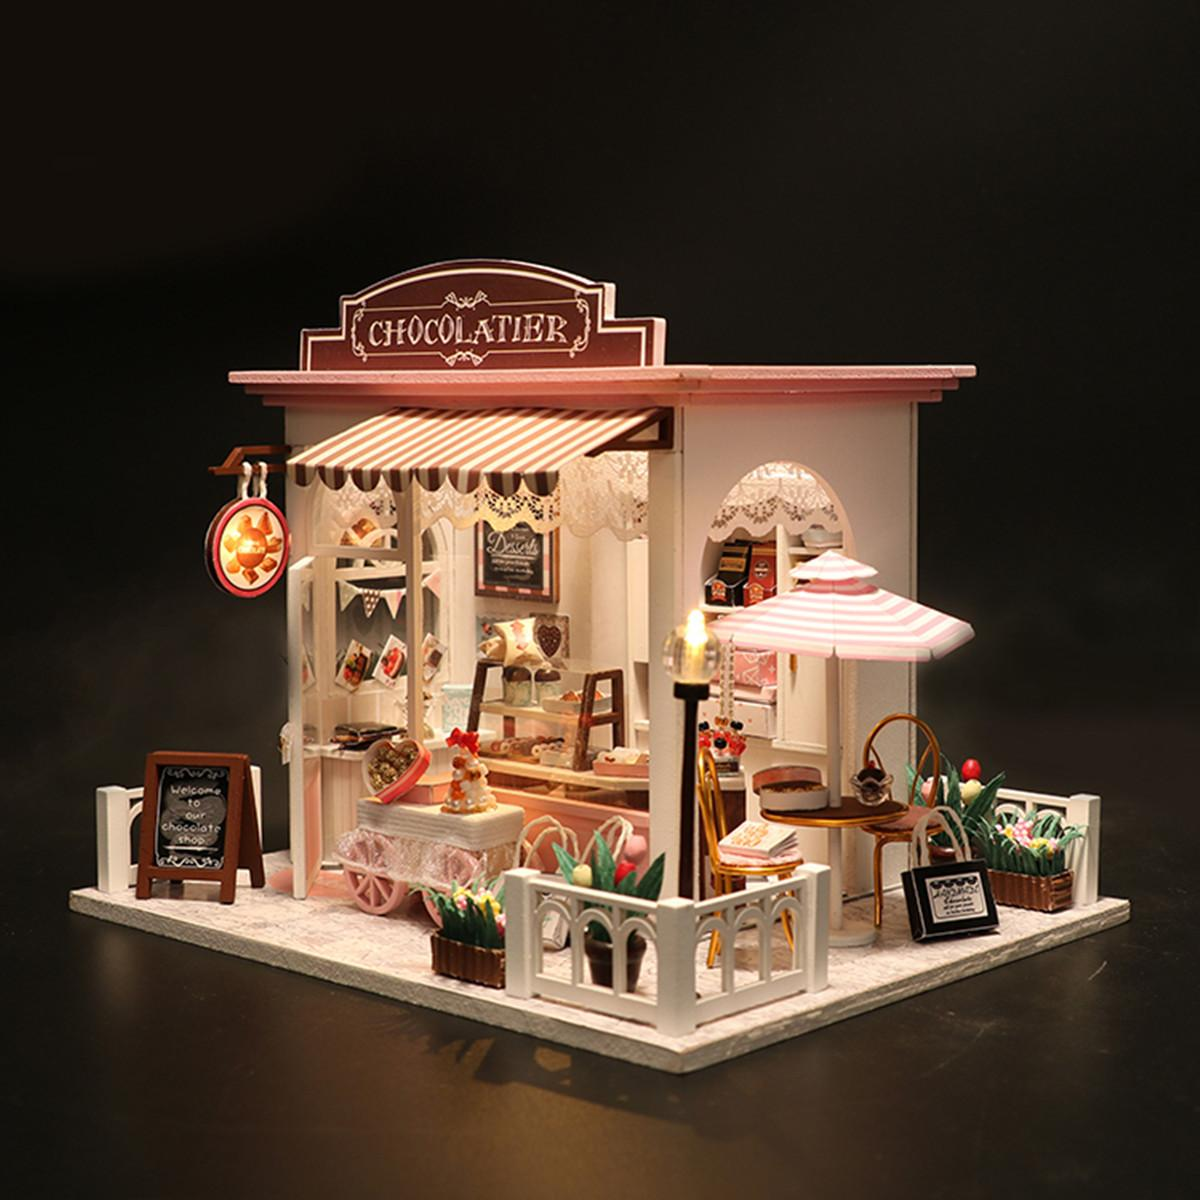 Diy Doll House Kit Set Miniature Handmade House Cake Shop Kids Craft